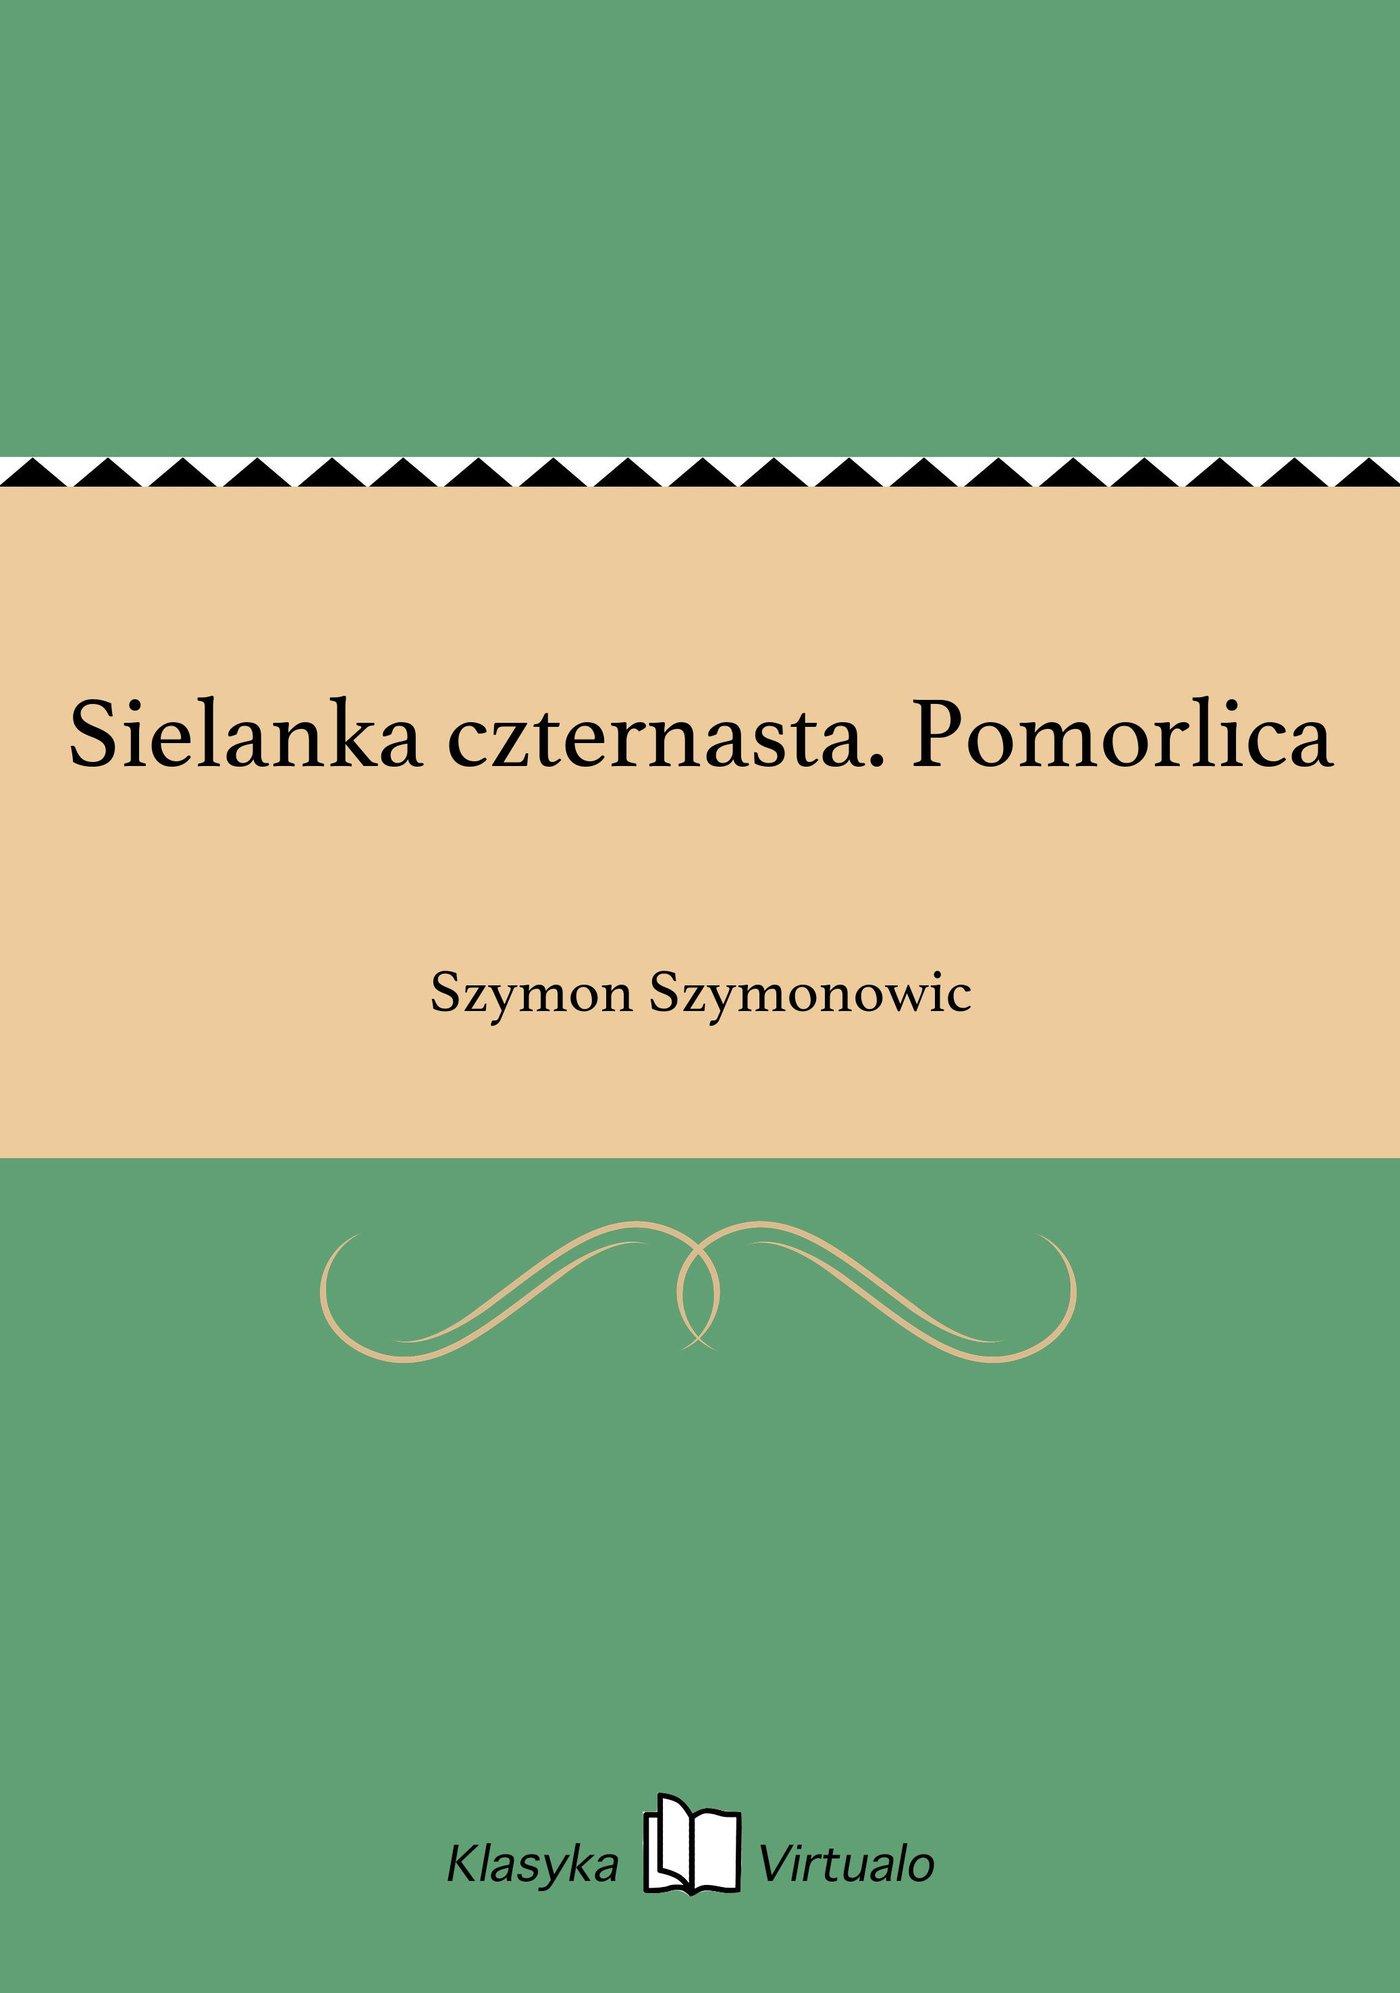 Sielanka czternasta. Pomorlica - Ebook (Książka EPUB) do pobrania w formacie EPUB